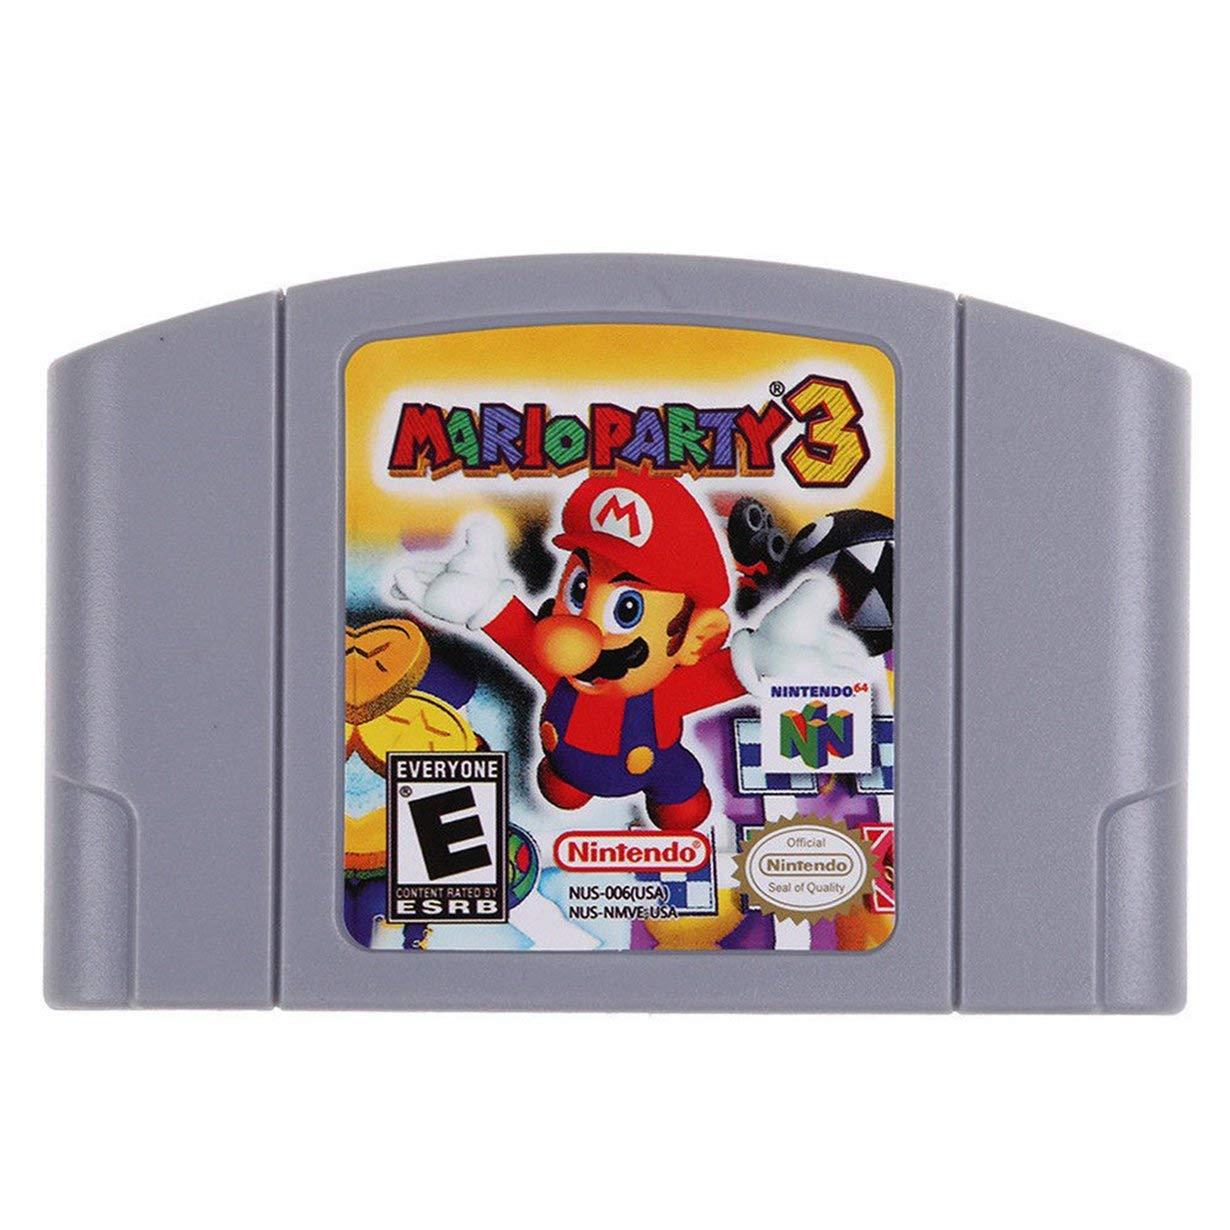 sumicorp.com grau marioparty3 camellia Fr nintend 64 n64 Mario ...